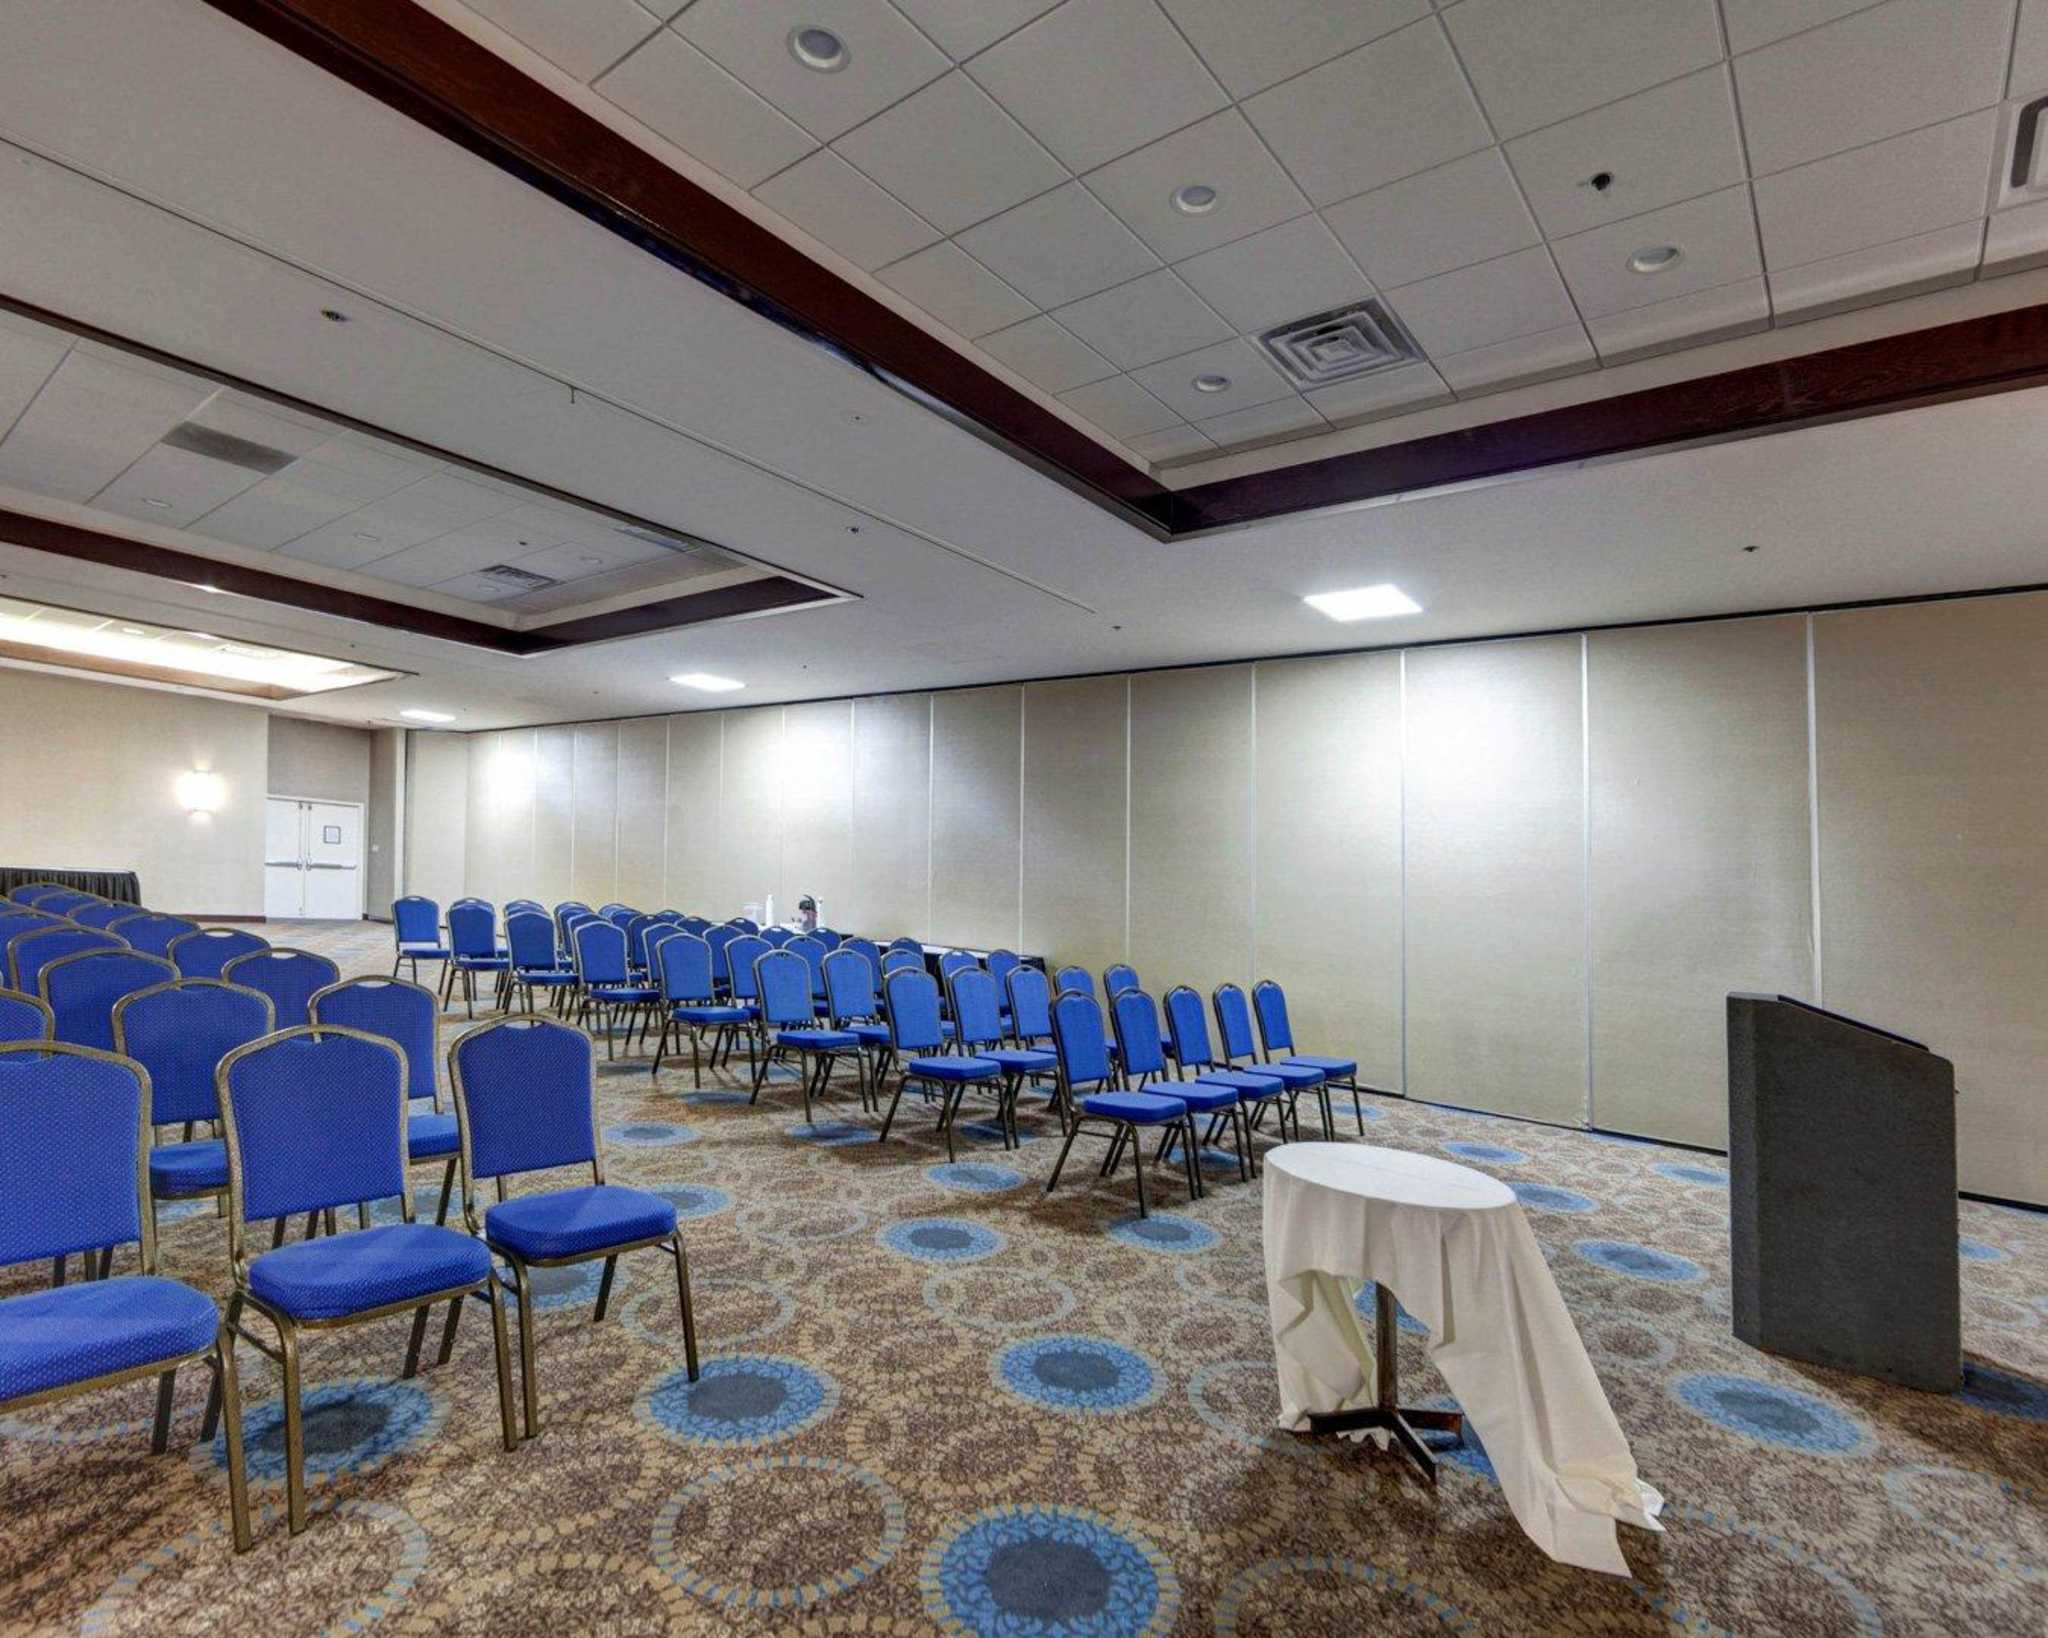 Comfort Inn & Suites Plano East image 25